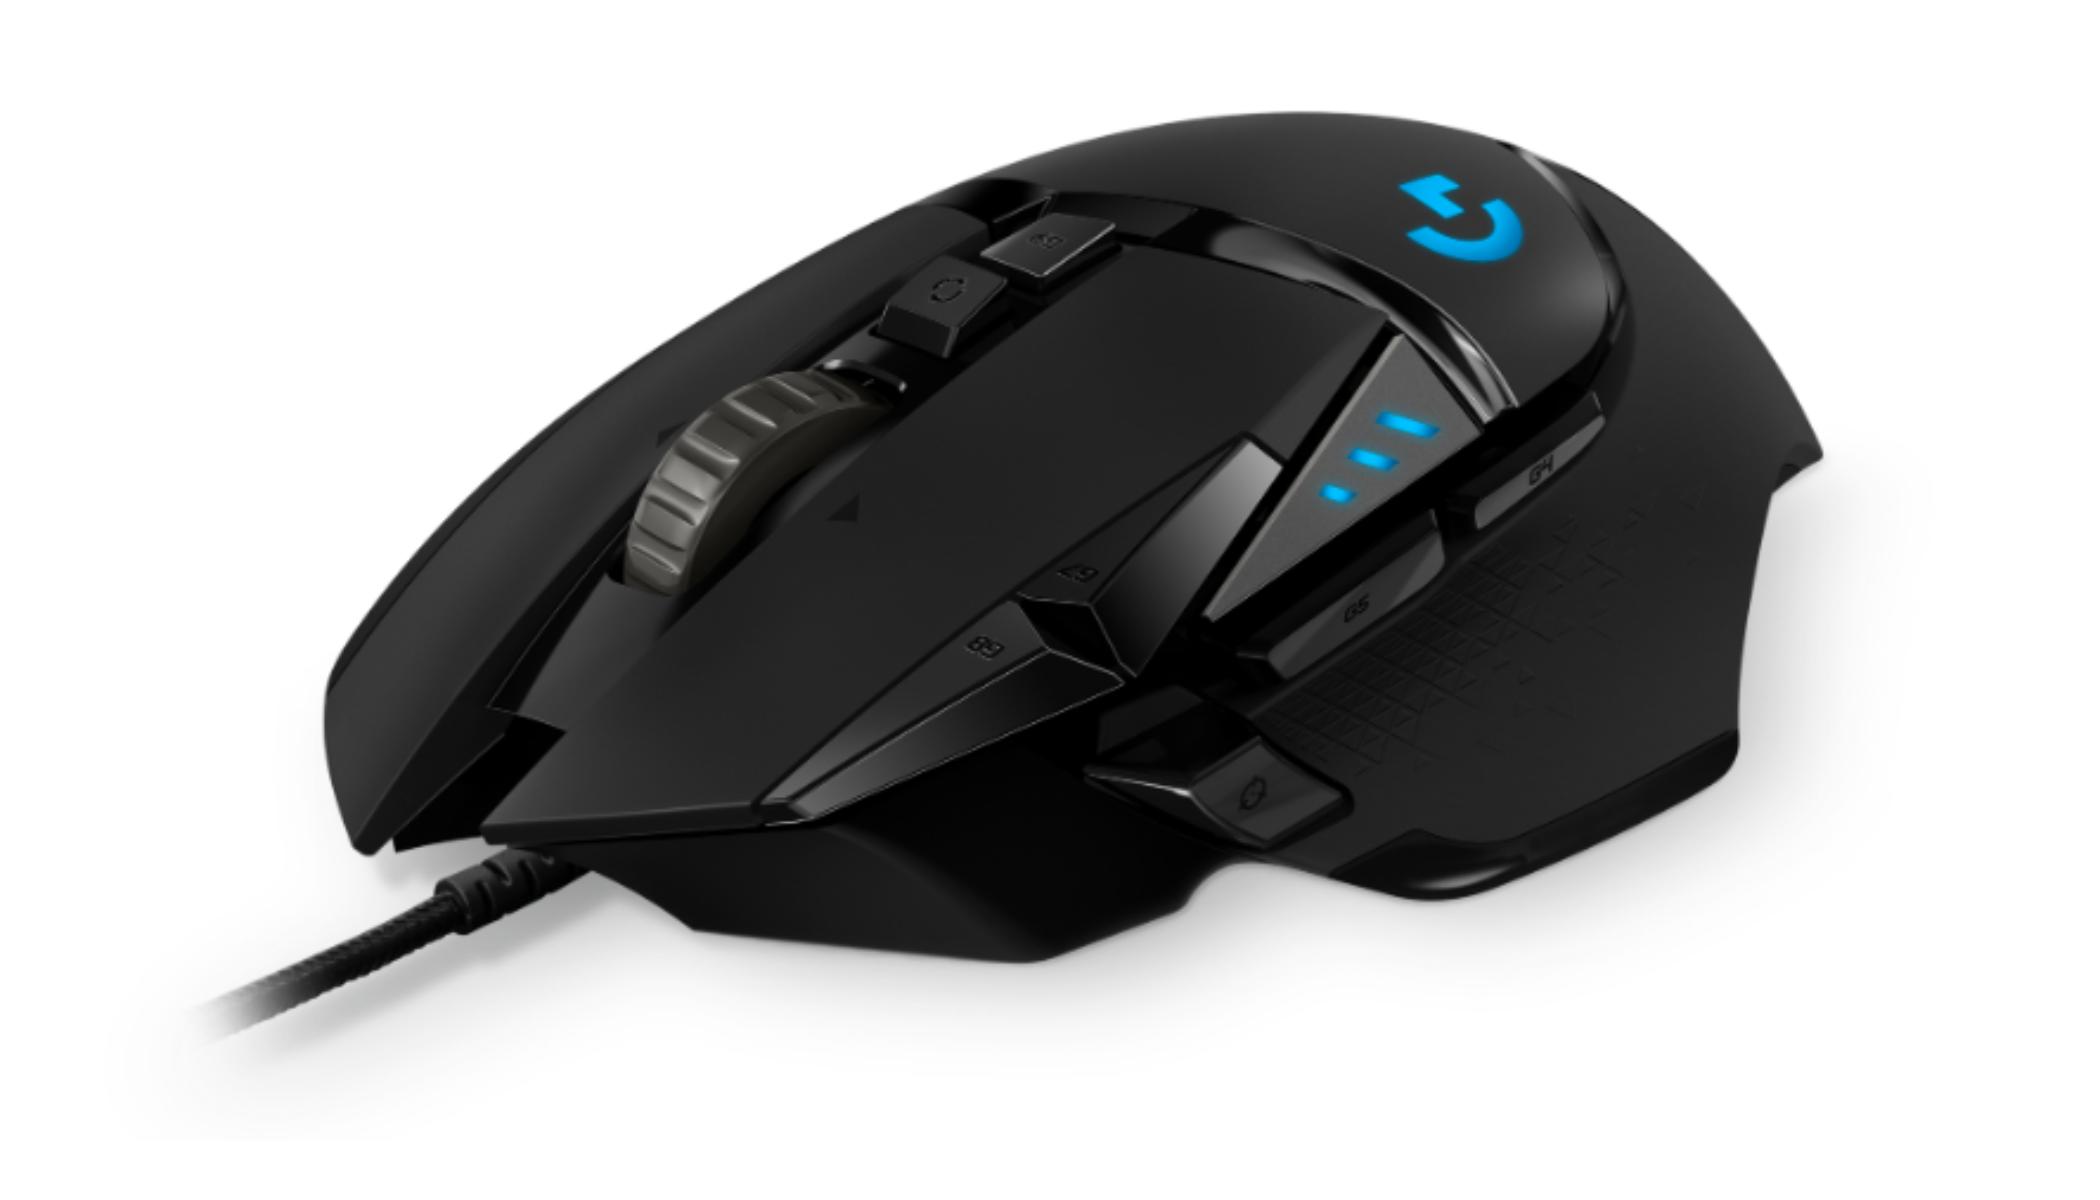 Award-Winning Logitech G502 Gaming Mouse Gets Revolutionary